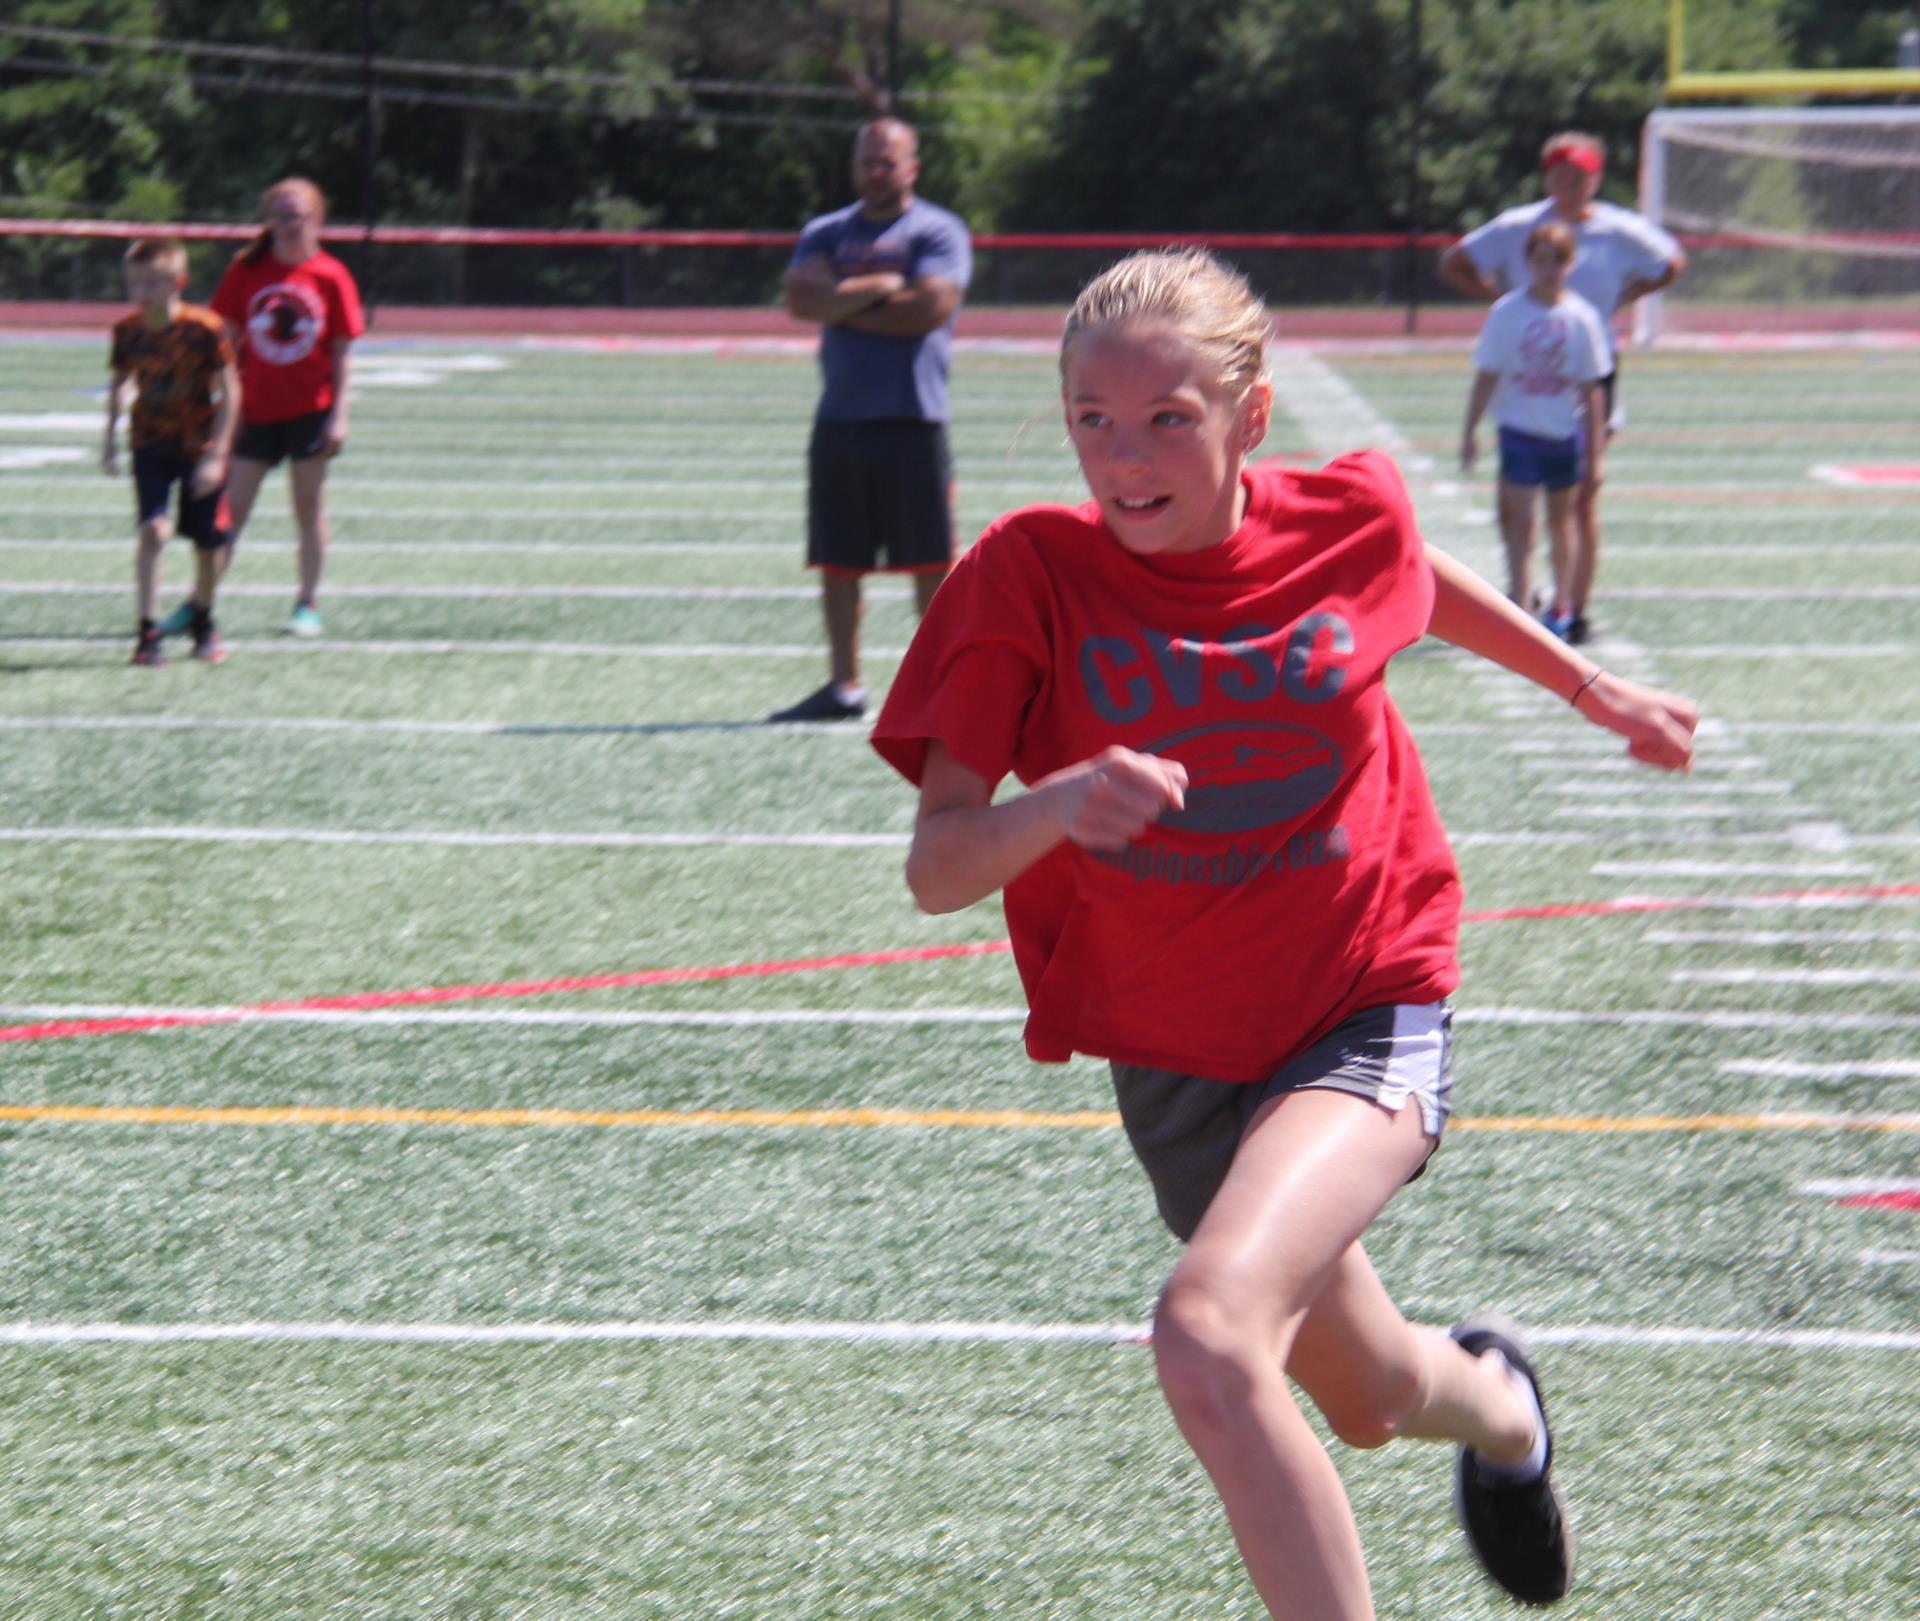 student sprinting